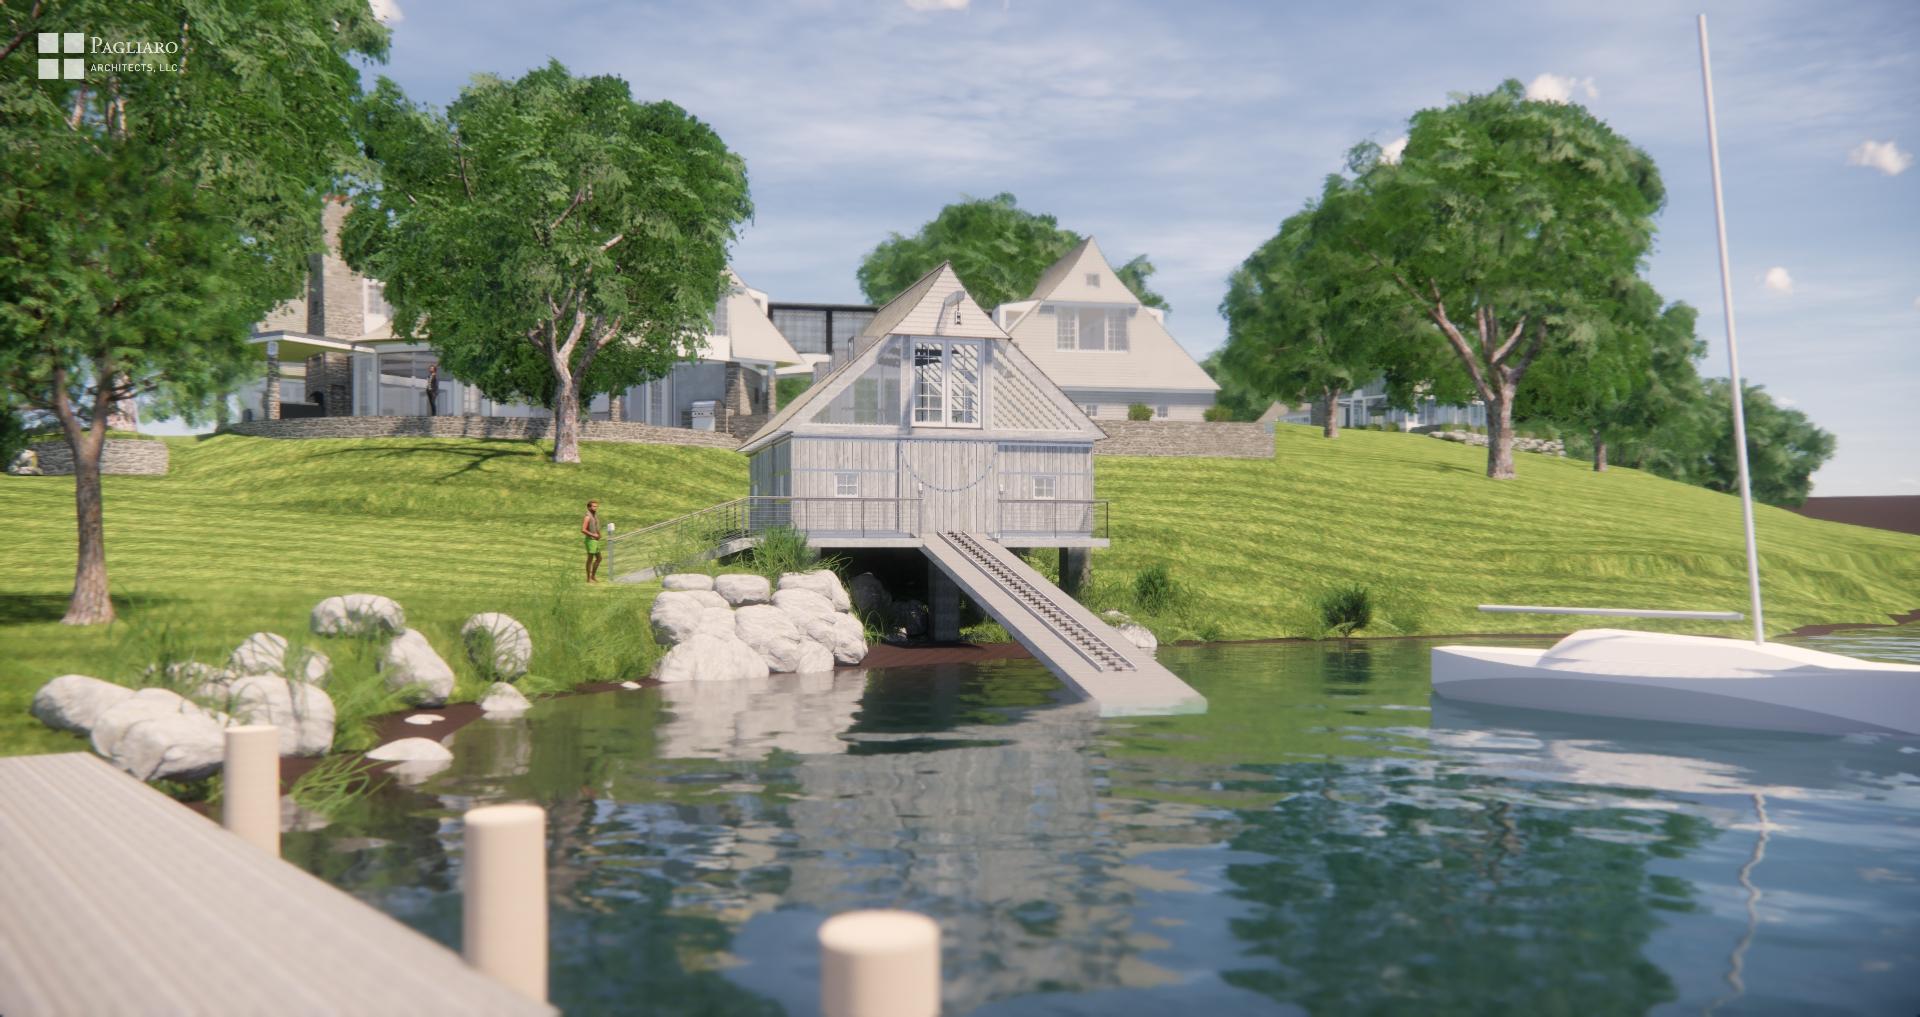 33-35 Money Point - 2019.07.10 Boat House Exterior 02.jpg